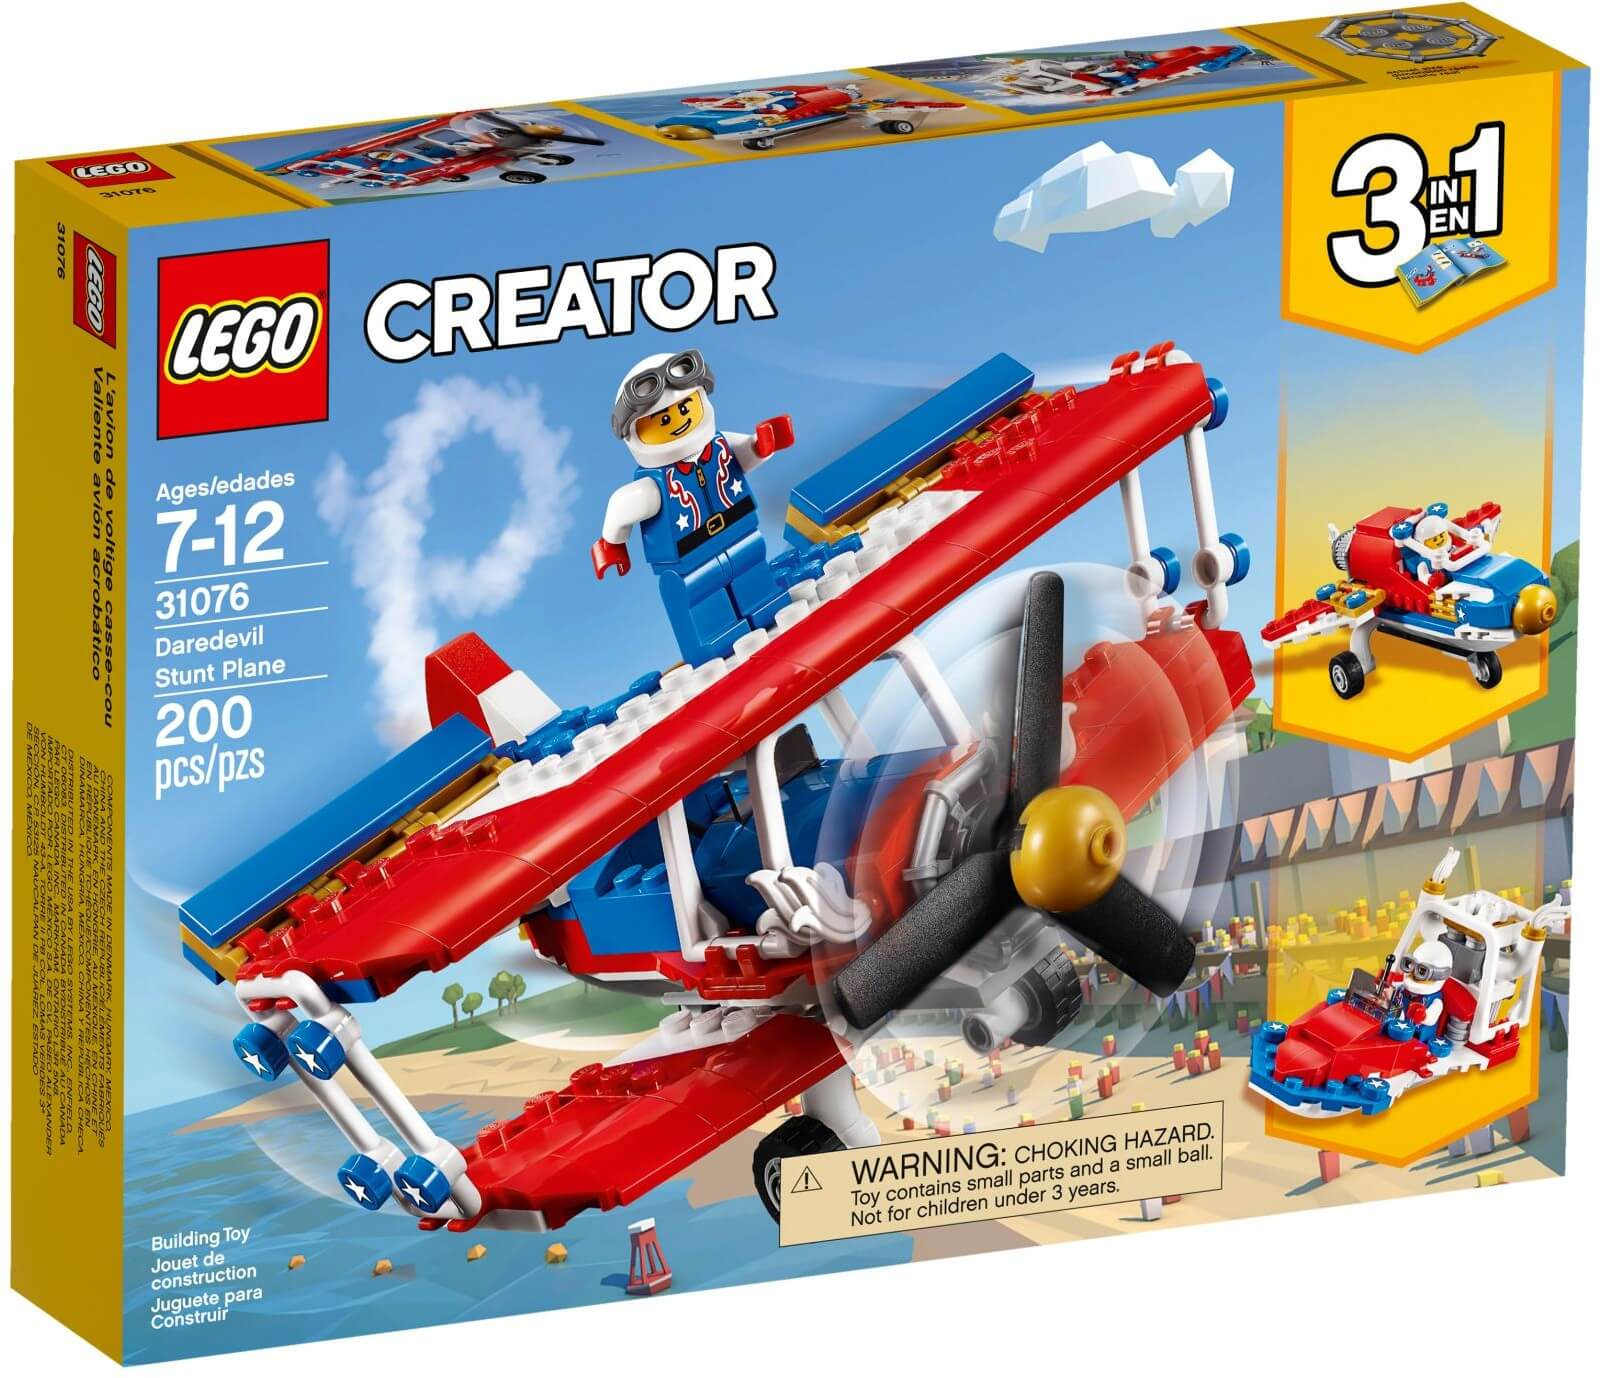 Mua đồ chơi LEGO 31076 - LEGO Creator 31076 - Xếp hình Máy Bay - Thuyền Đua biểu diễn 3-trong-1 (LEGO Creator 31076 Daredevil Stunt Plane)